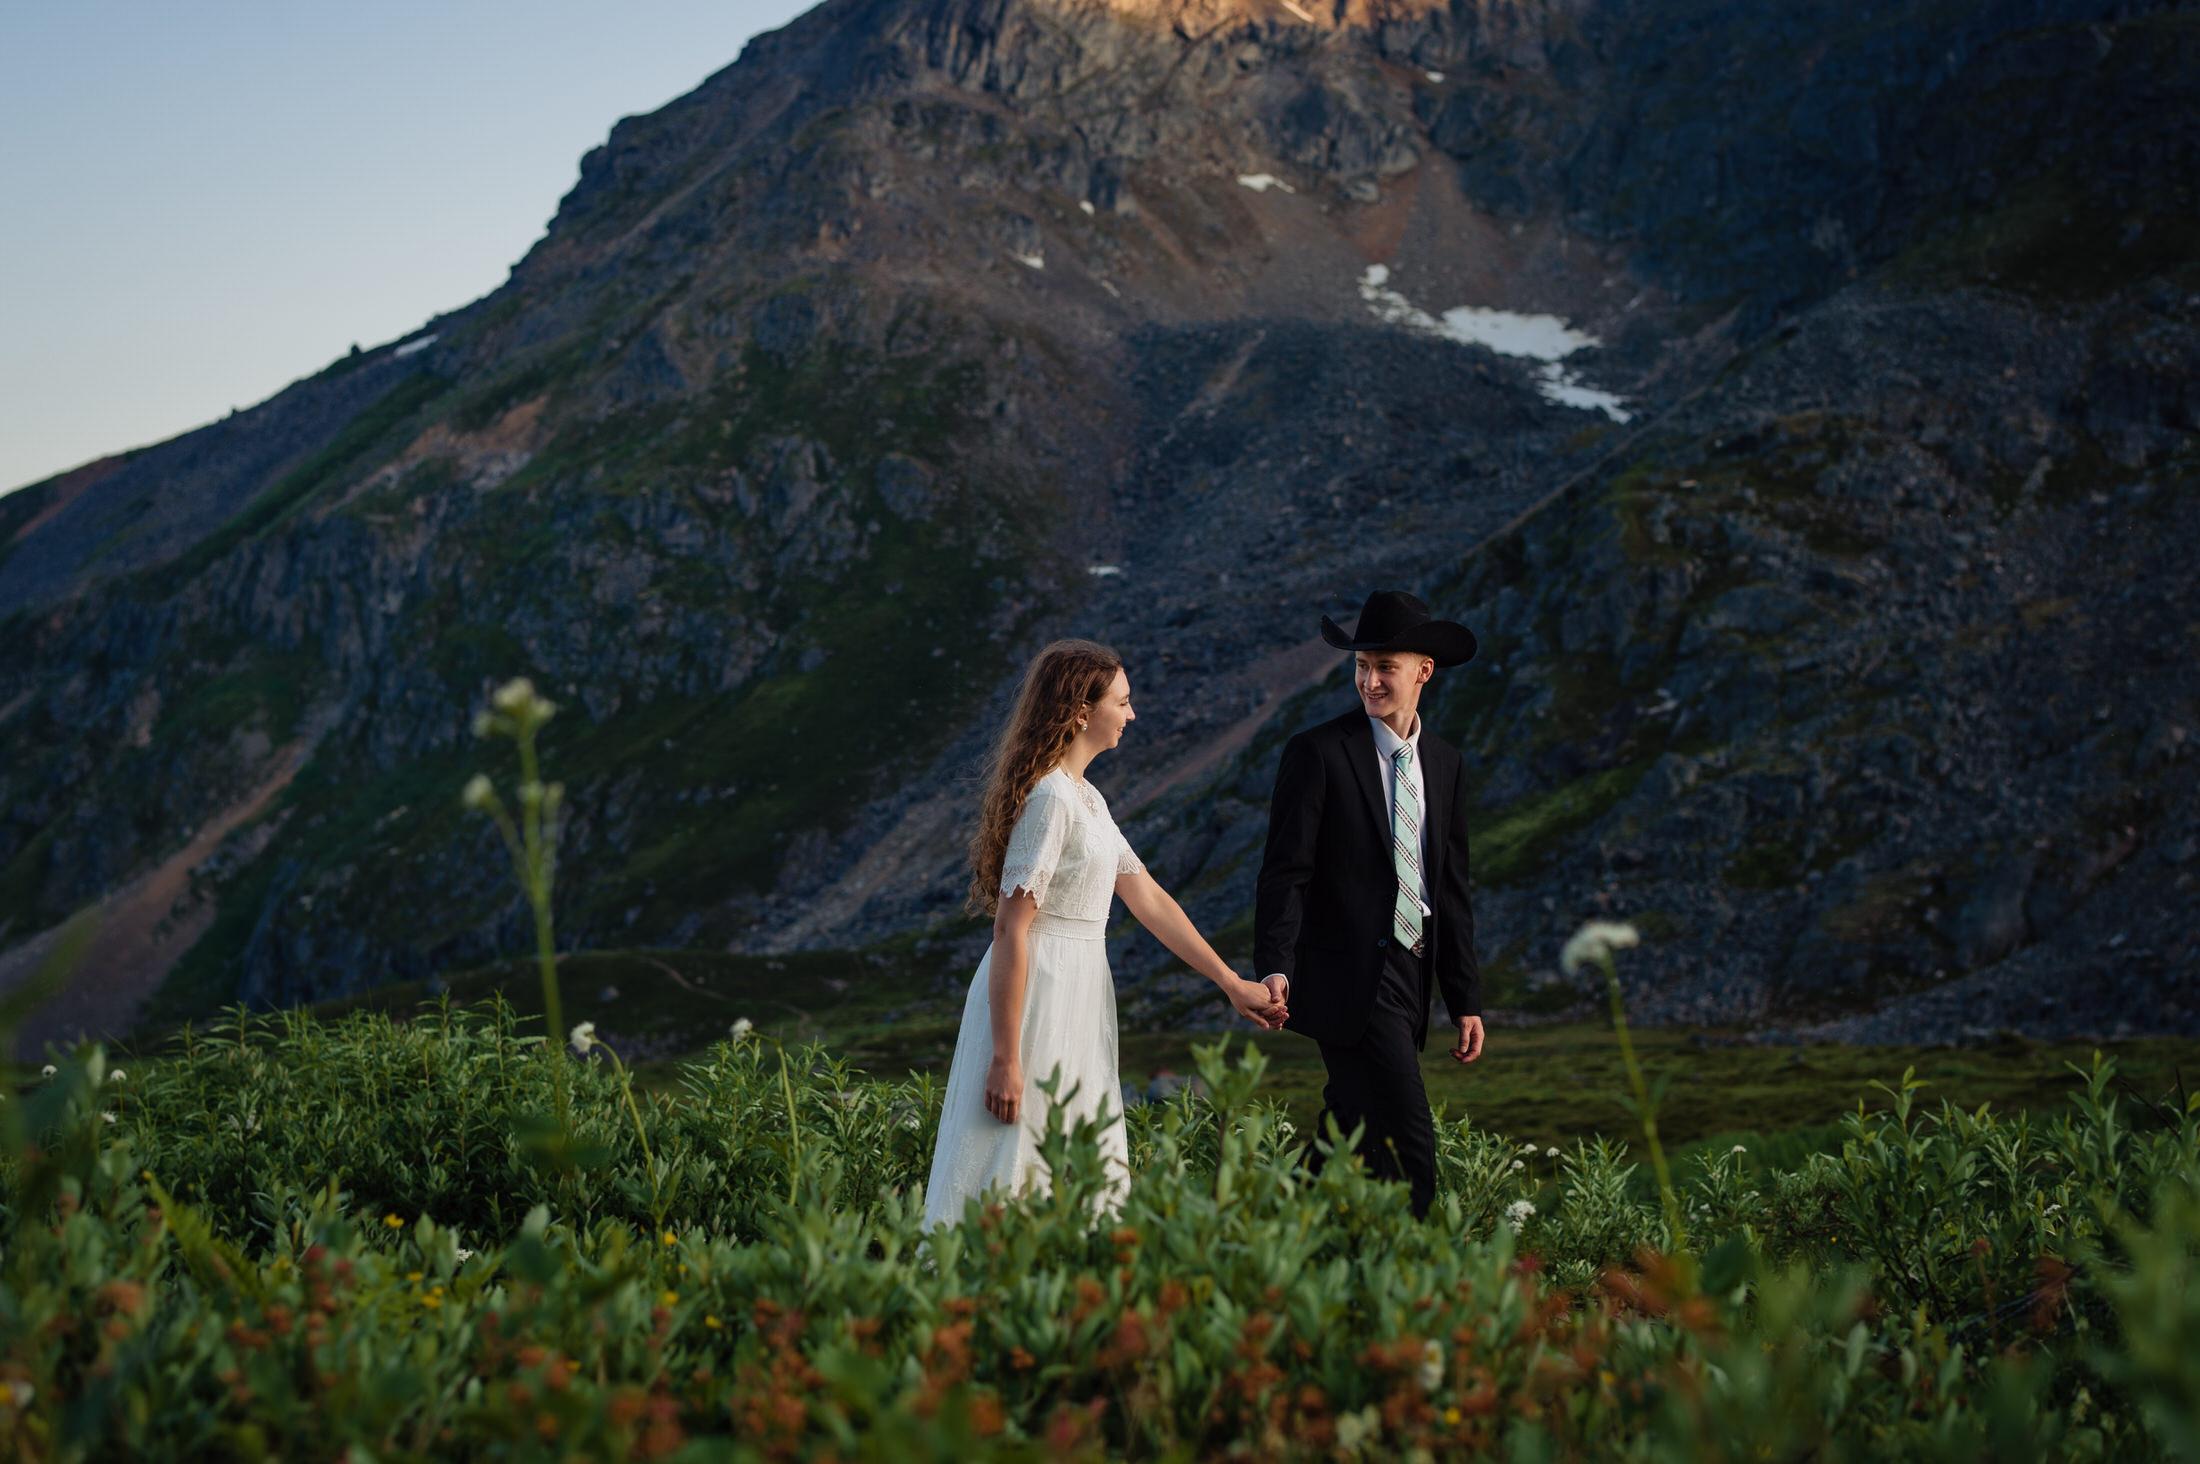 Hatcher pass wedding portrait photographer